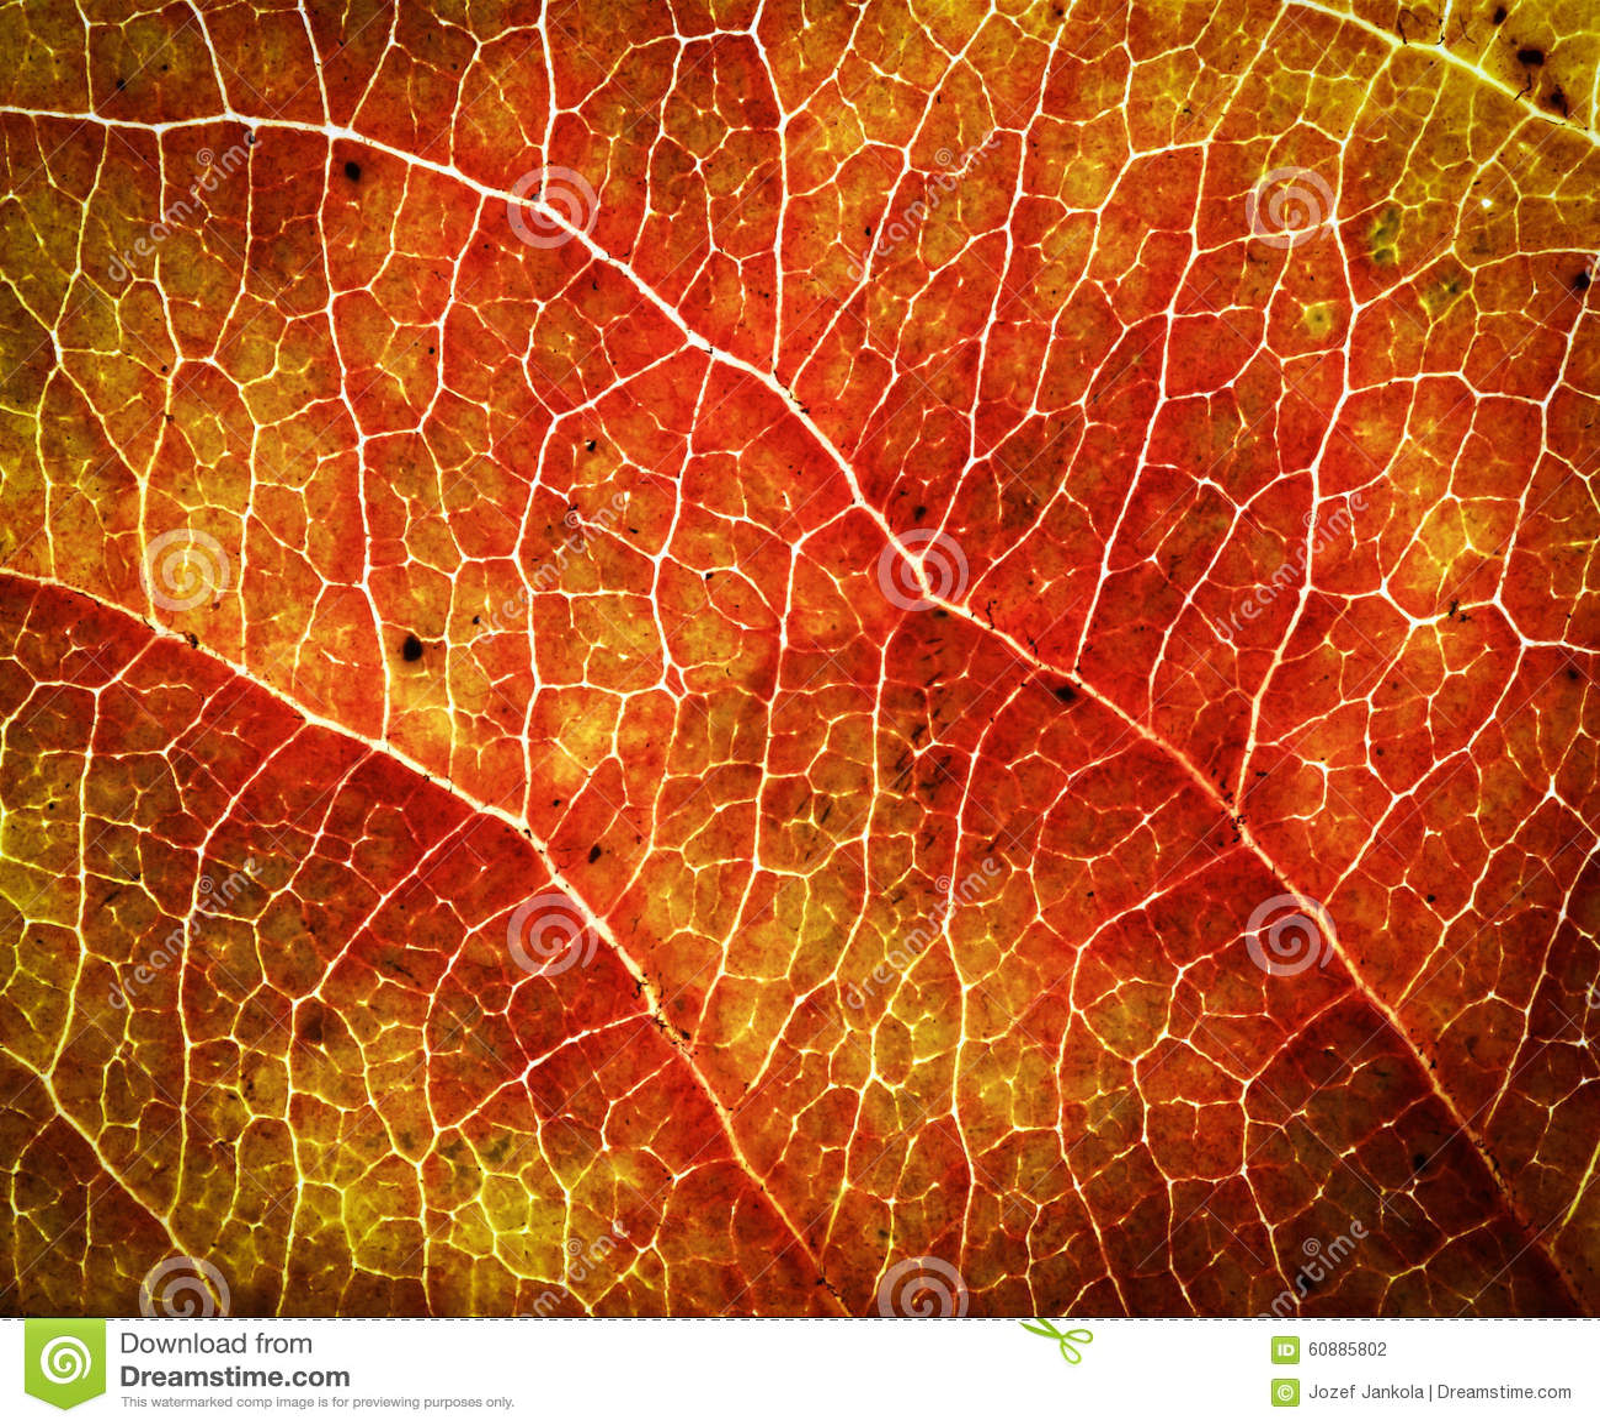 arbre rouge orange de feuille d 39 automne photo stock image 60885802. Black Bedroom Furniture Sets. Home Design Ideas